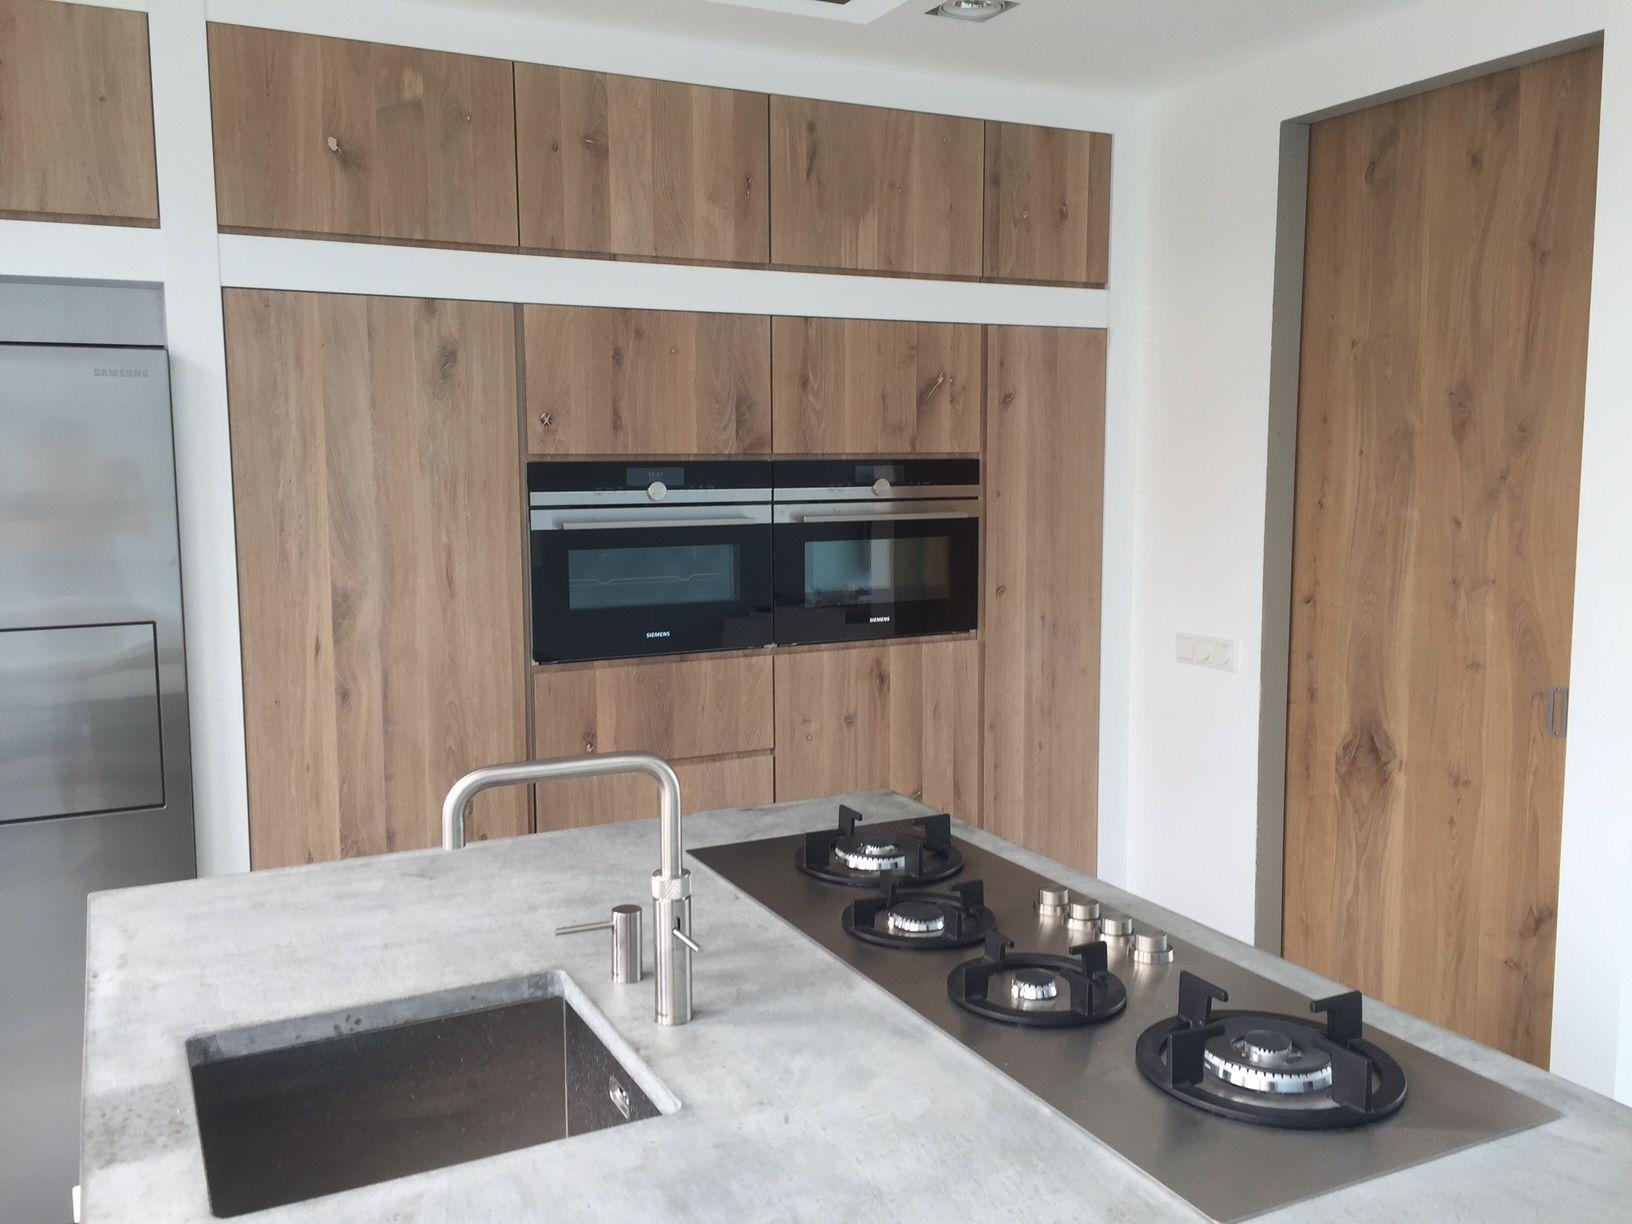 Ikea kitchen inspiration koak ikea 100 your design - Ikea cocinas electrodomesticos ...